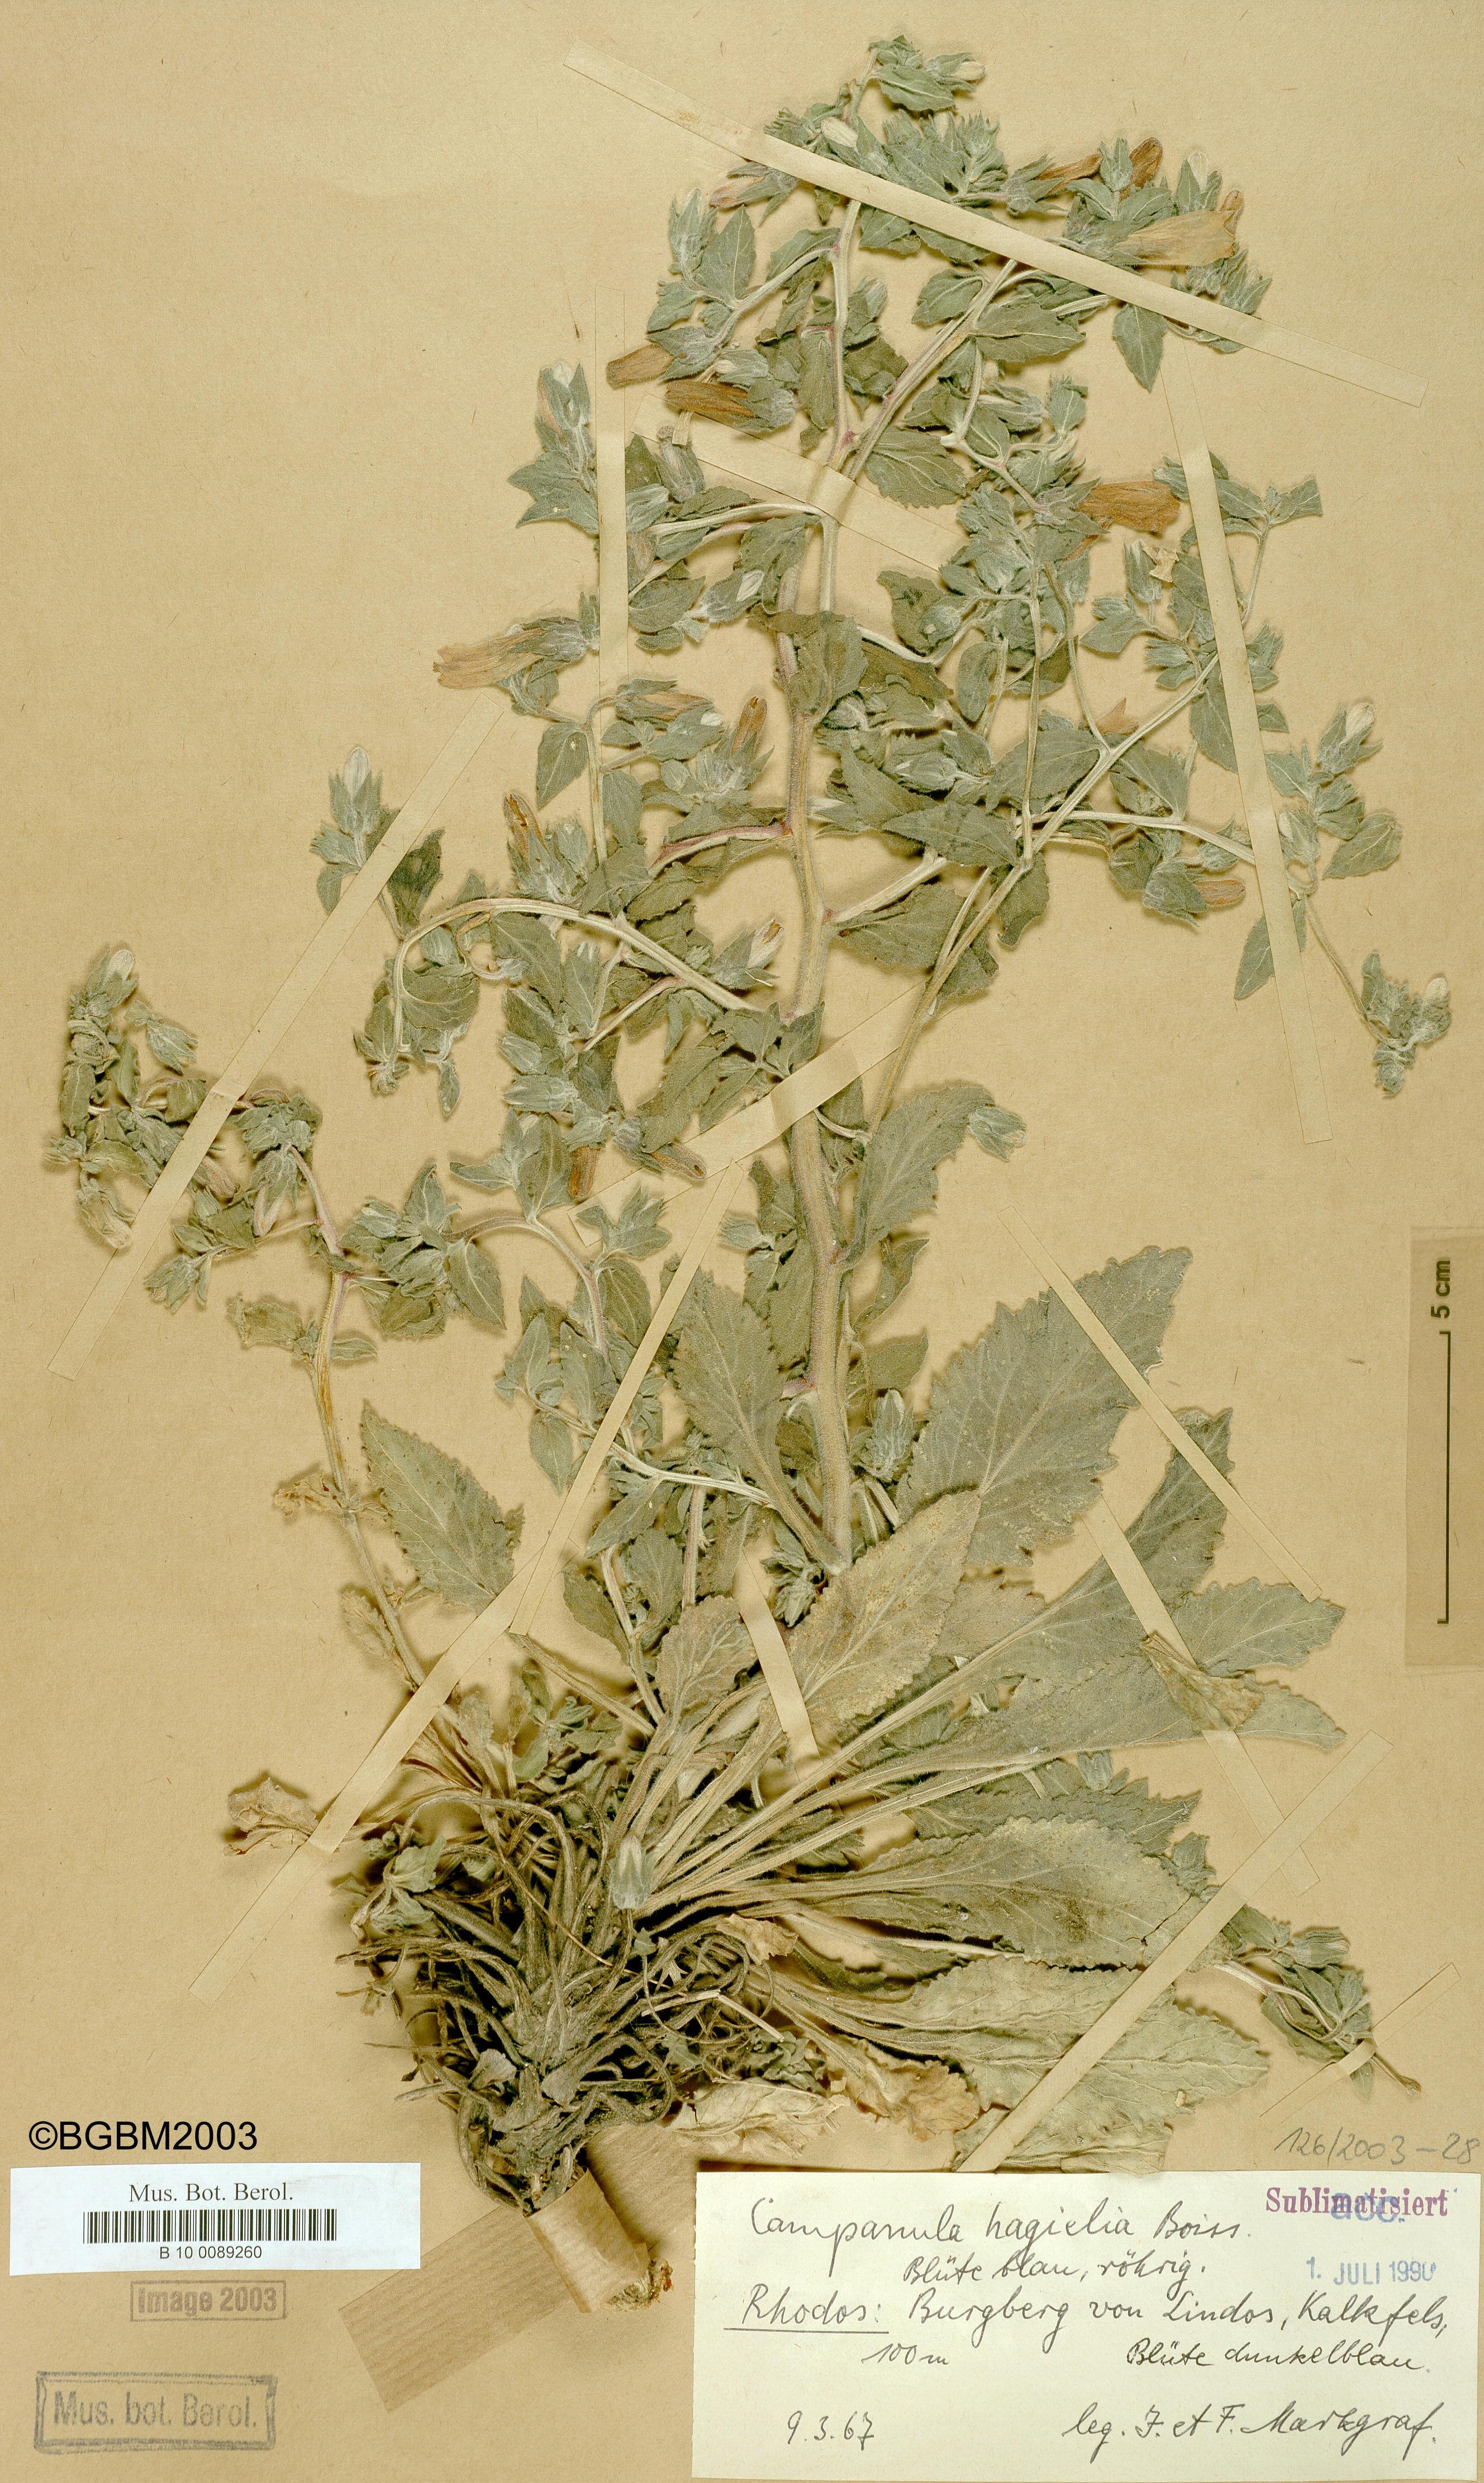 http://ww2.bgbm.org/herbarium/images/B/10/00/89/26/B_10_0089260.jpg